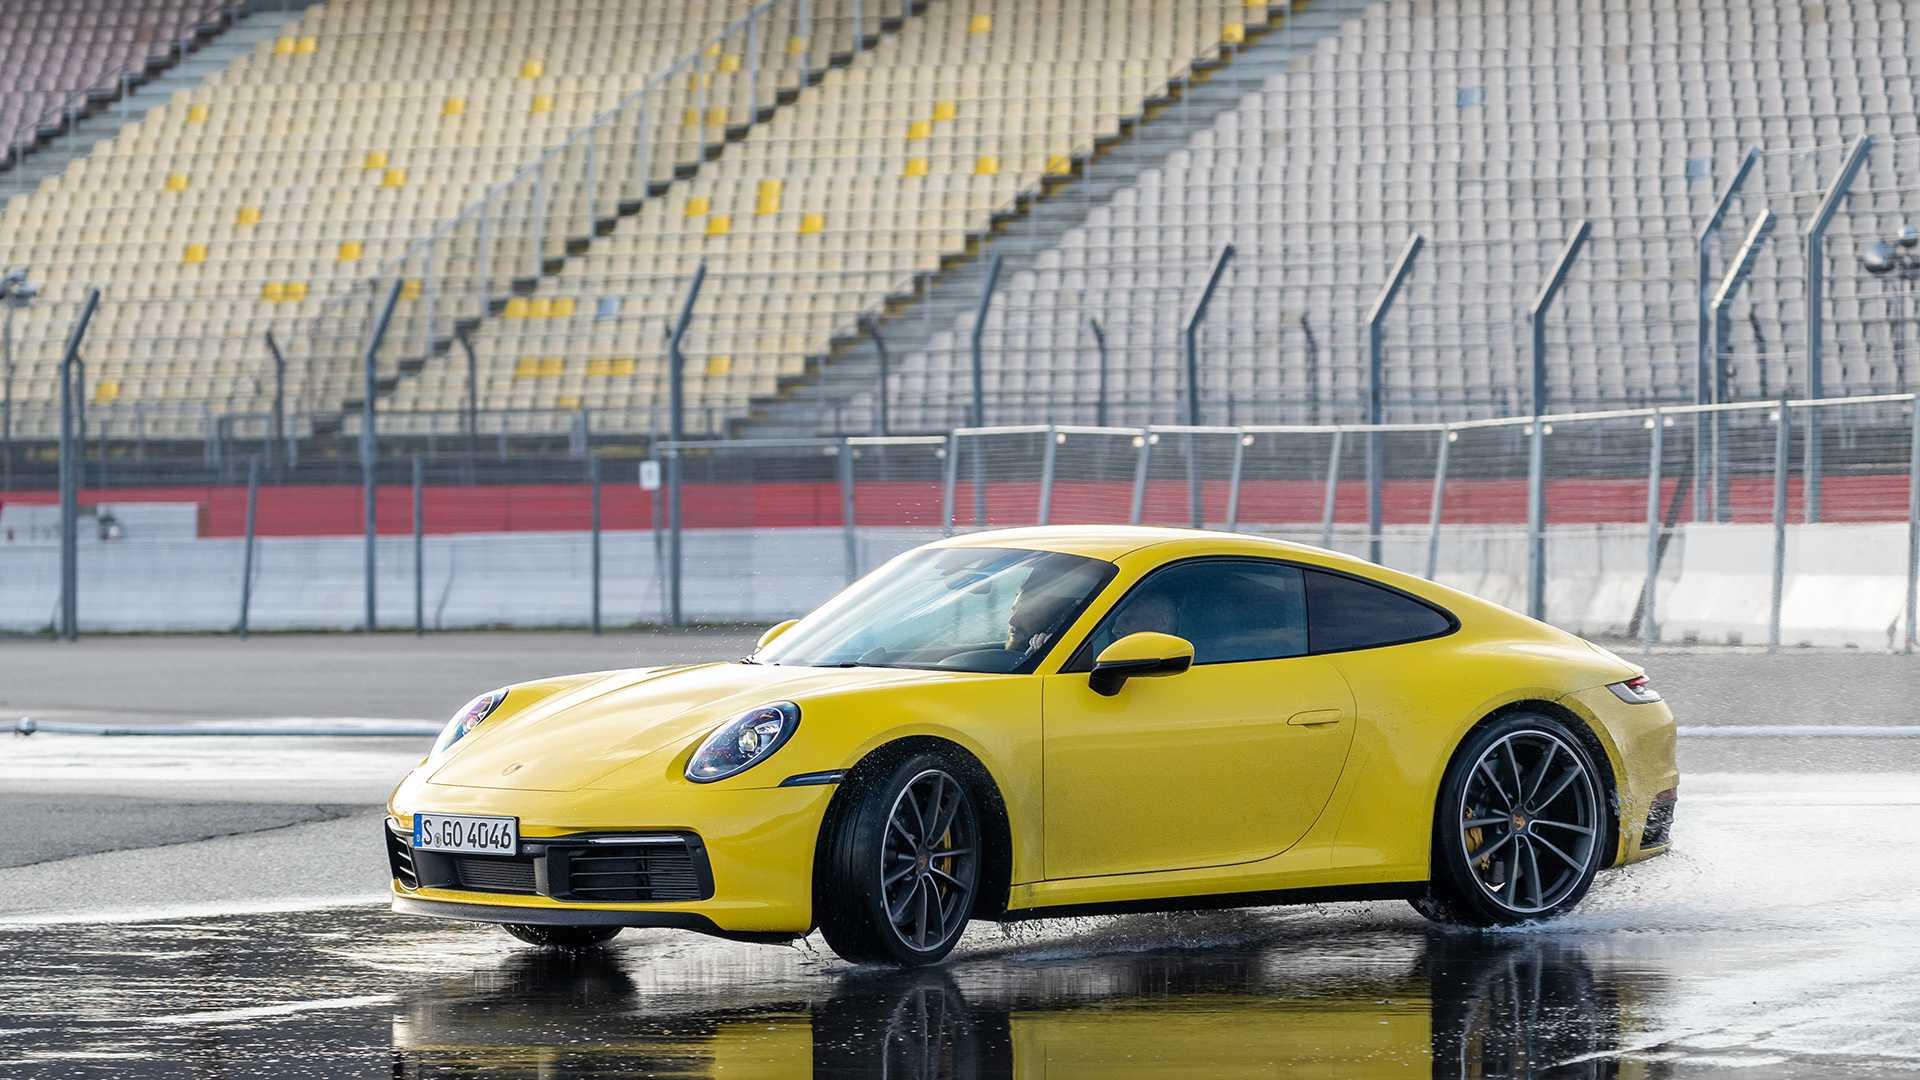 Novi Porsche 911 detektuje vlažan kolovoz i automatski prilagođava podešavanja (VIDEO)